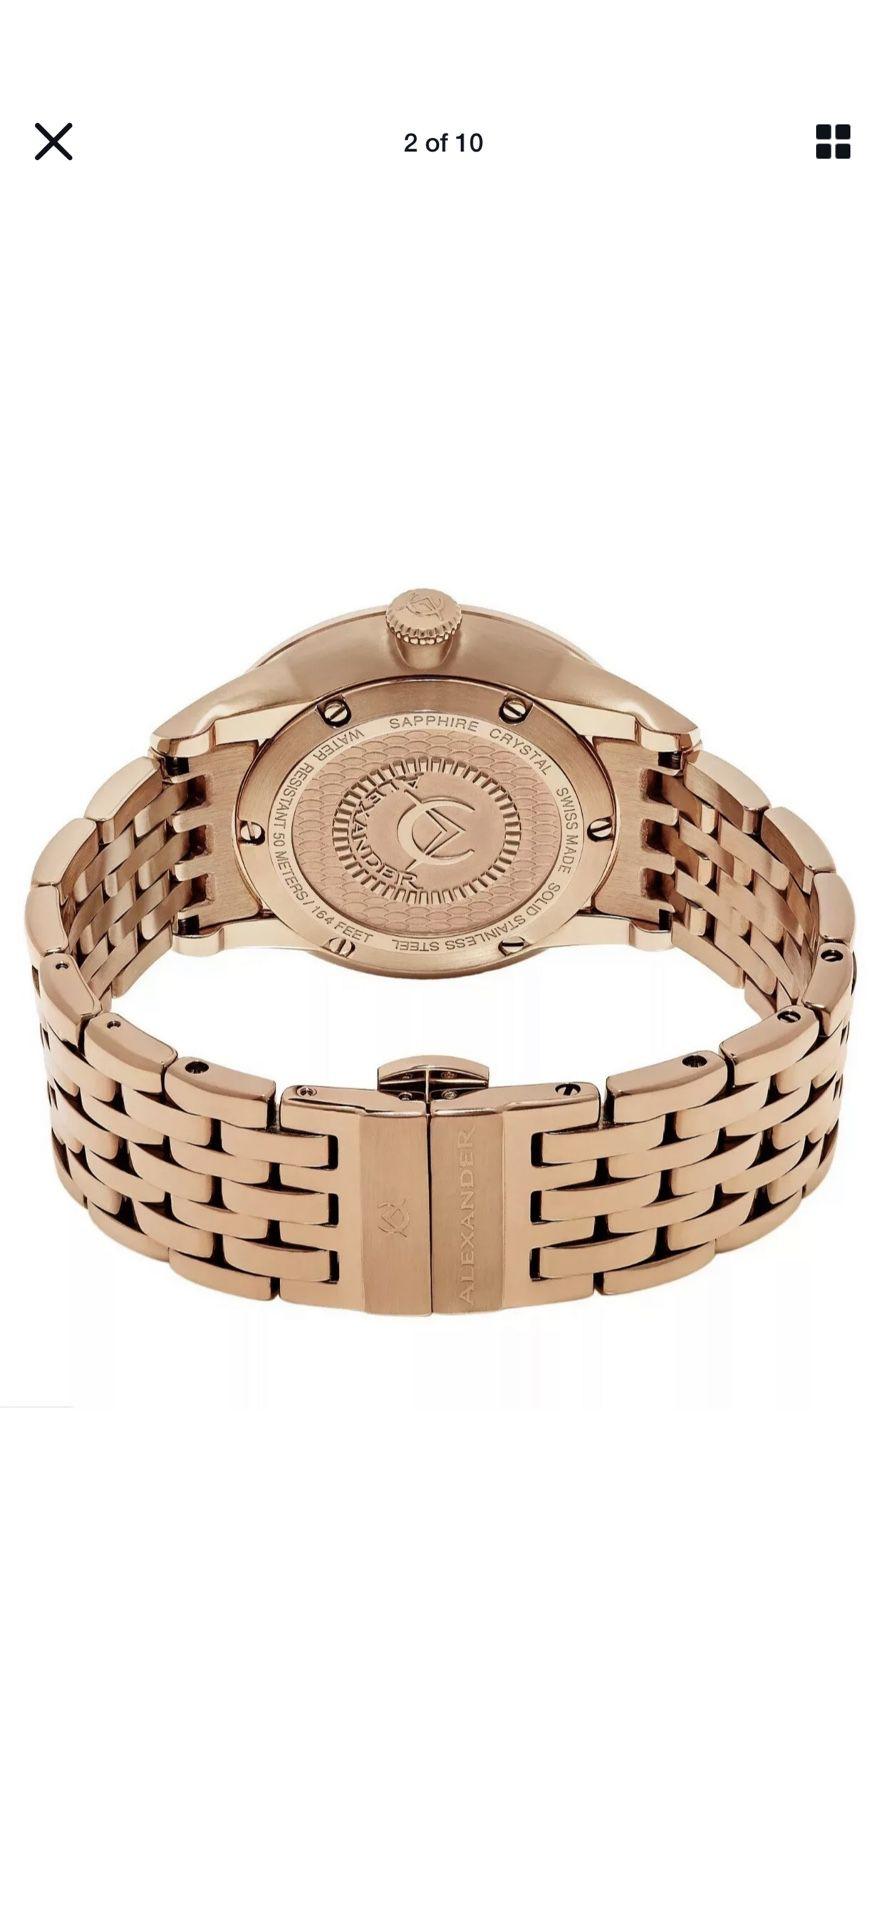 Alexander Men's Rose Gold Stainless Steel Link Bracelet Quartz Watch